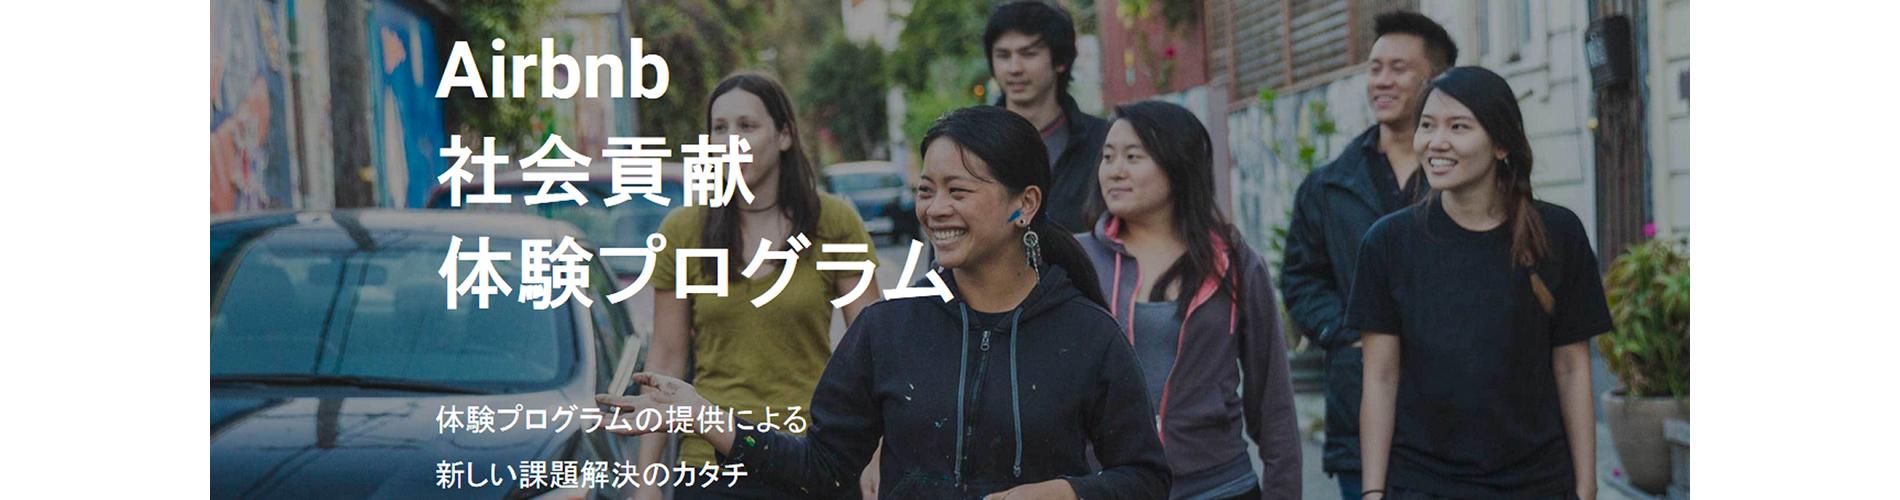 Airbnb 社会貢献体験プログラム